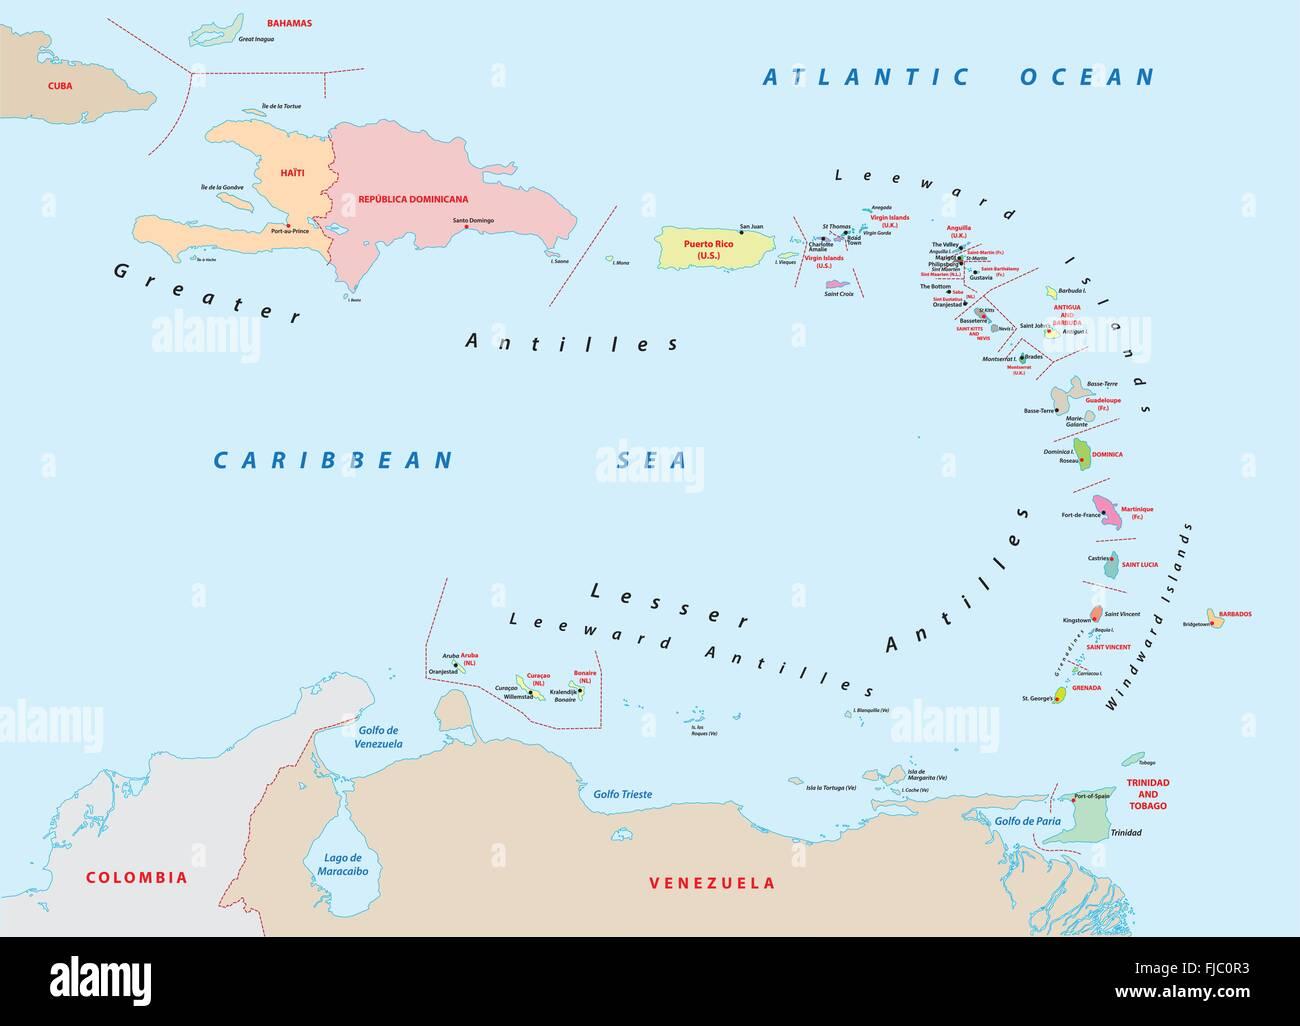 Kleine Antillen Karte.Kleine Antillen Karte Vektor Abbildung Bild 97379719 Alamy